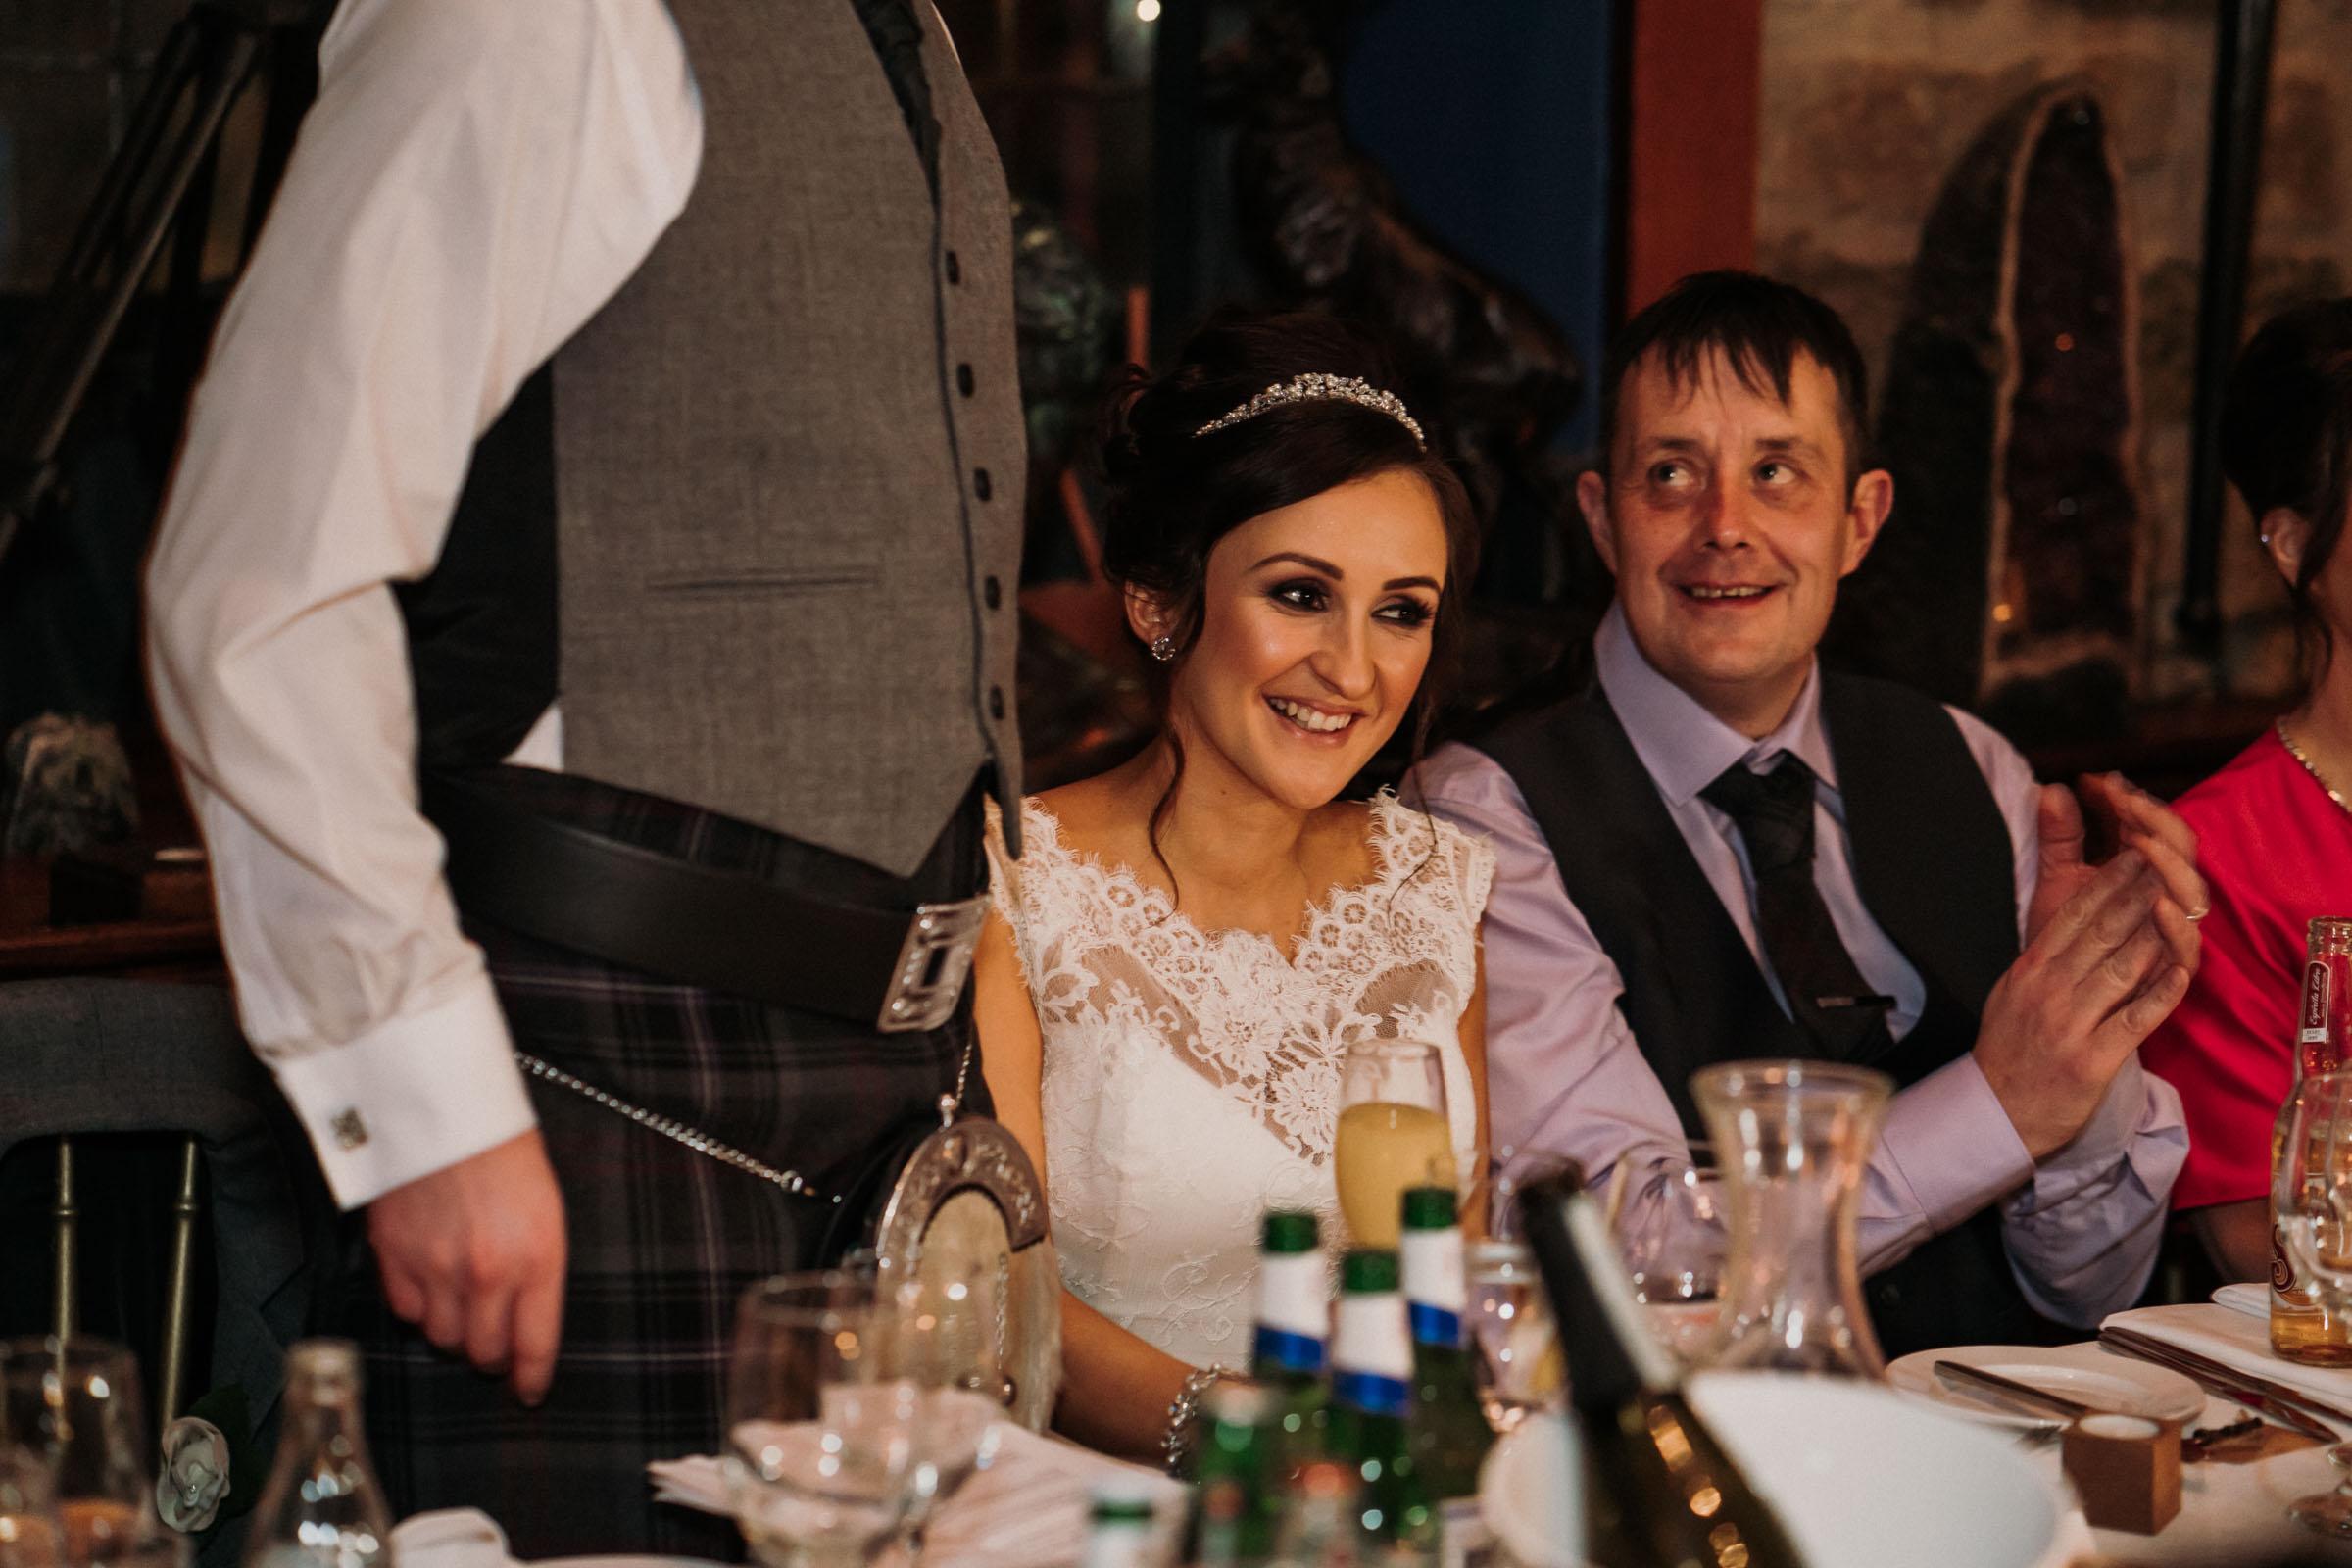 Oran-Mor-Wedding-Photographer-DearlyPhotography (33 of 55).jpg